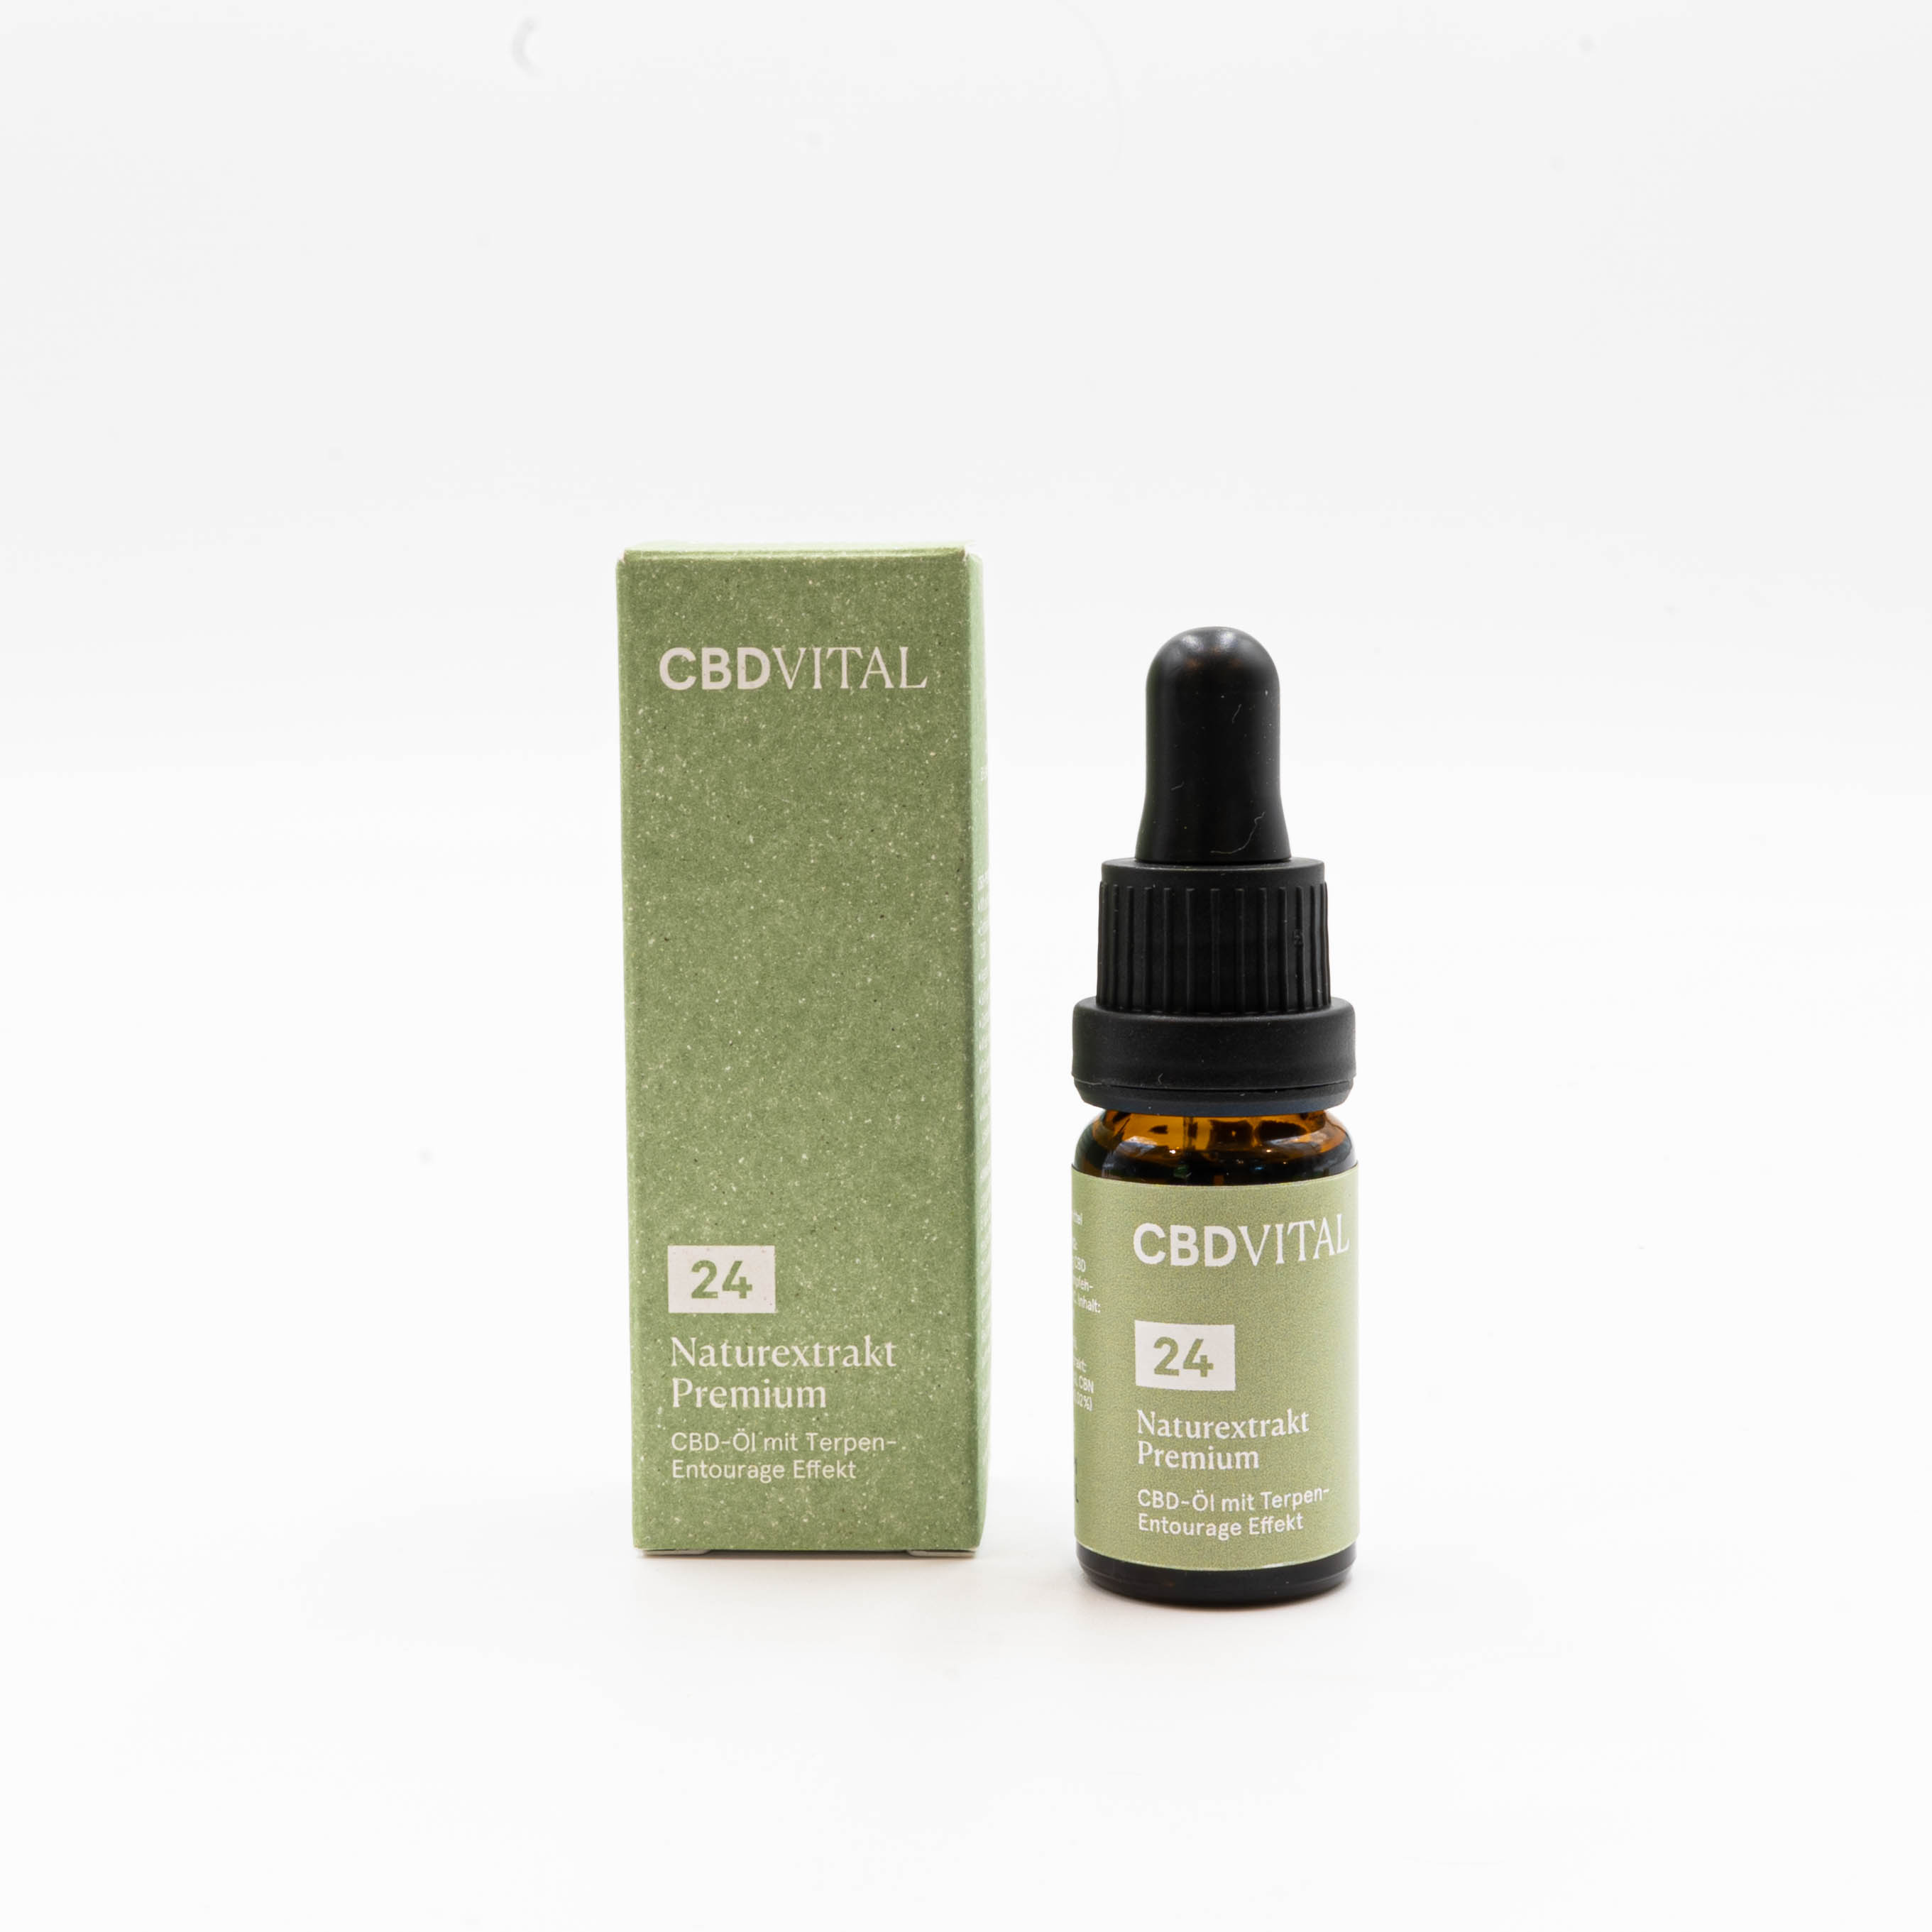 CBD Vital Naturextrakt Premium Öl 24% 10ml